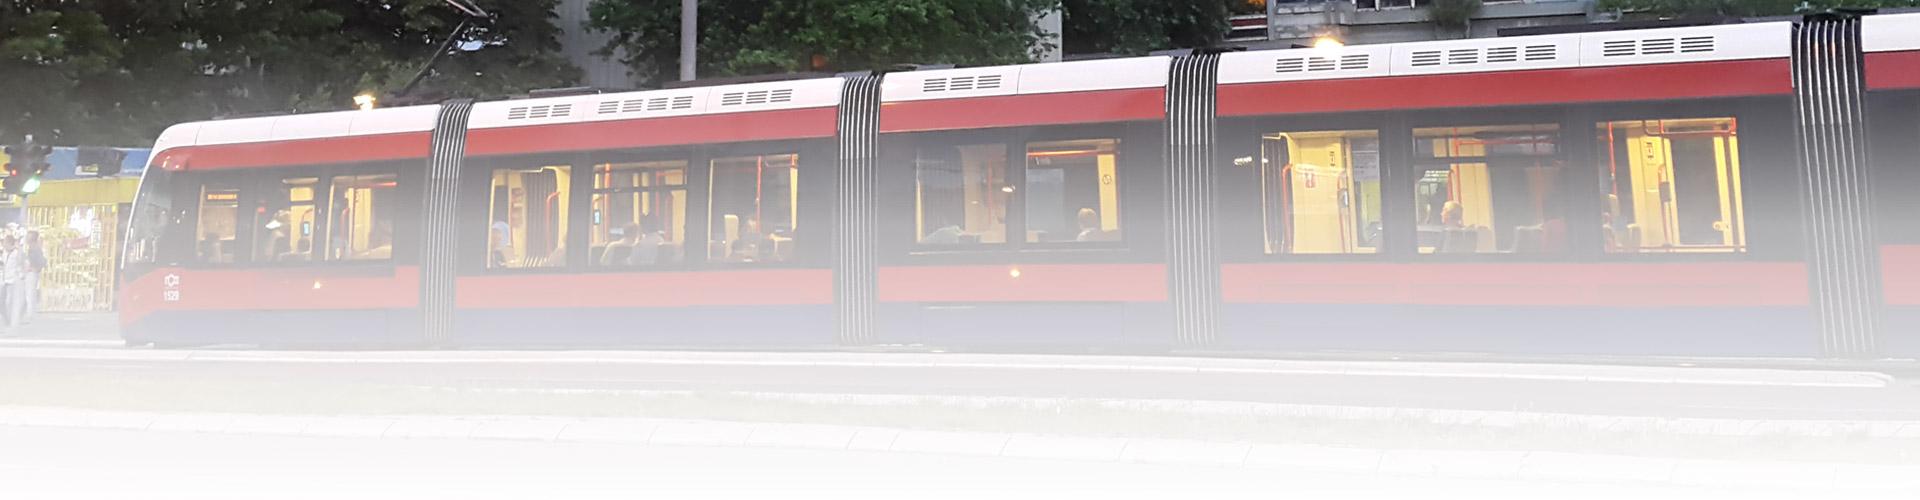 Transport in Belgrade - Novi Apartmani Beograd